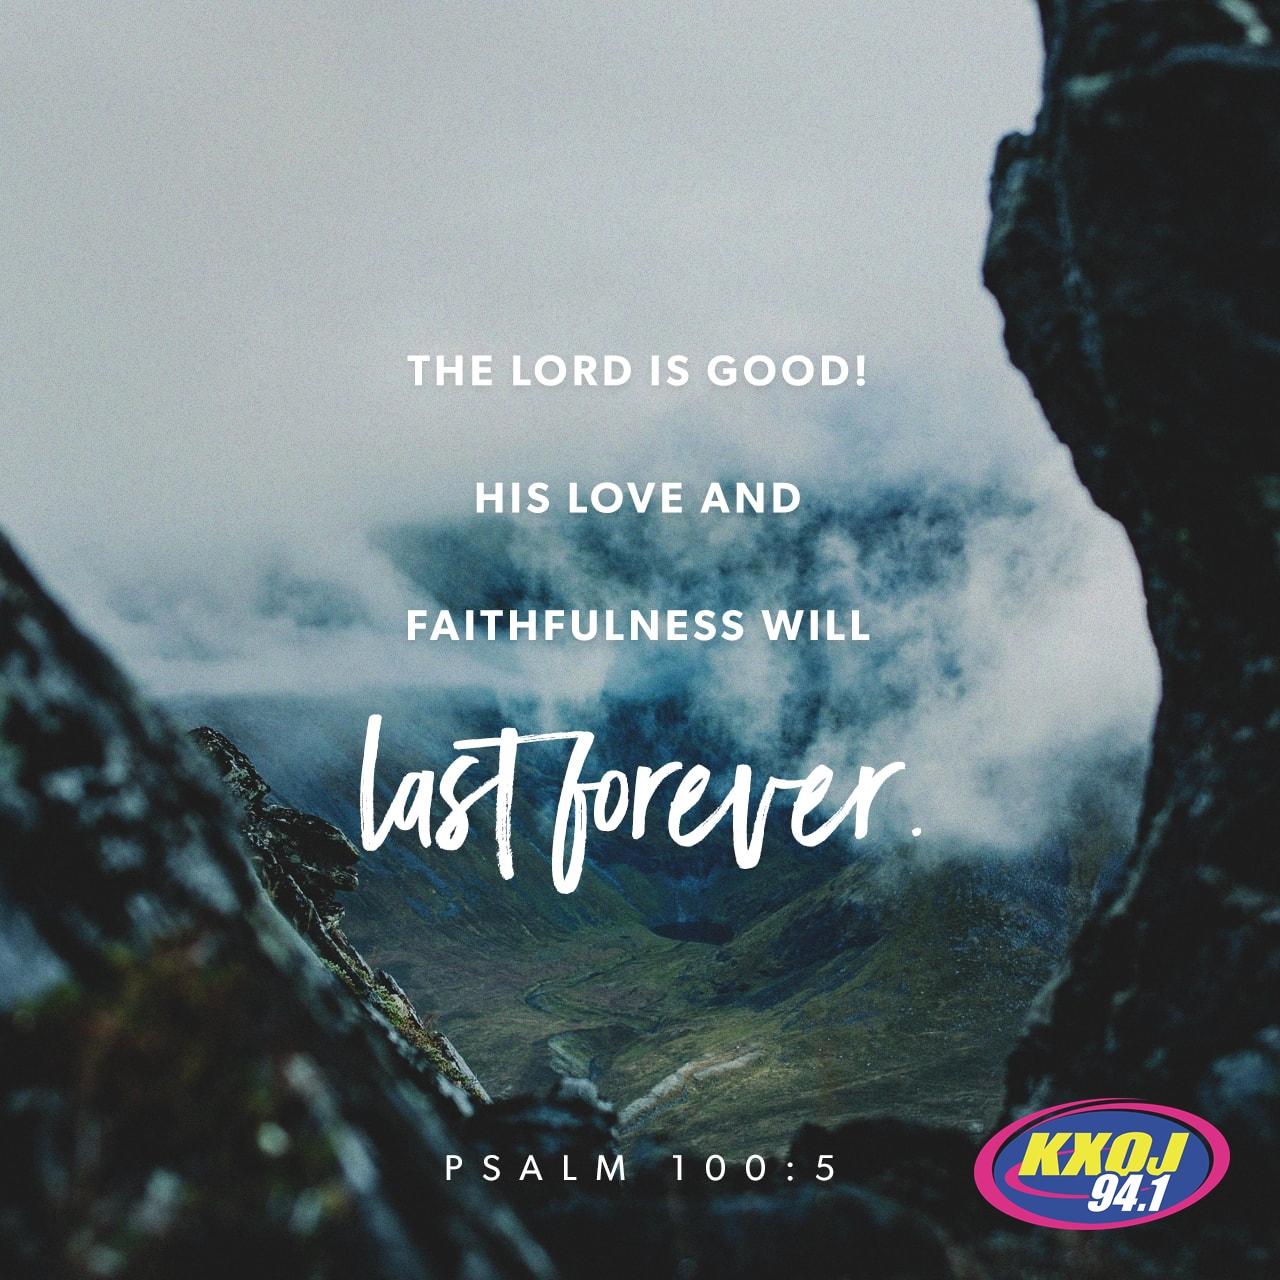 April 7th - Psalm 100:5